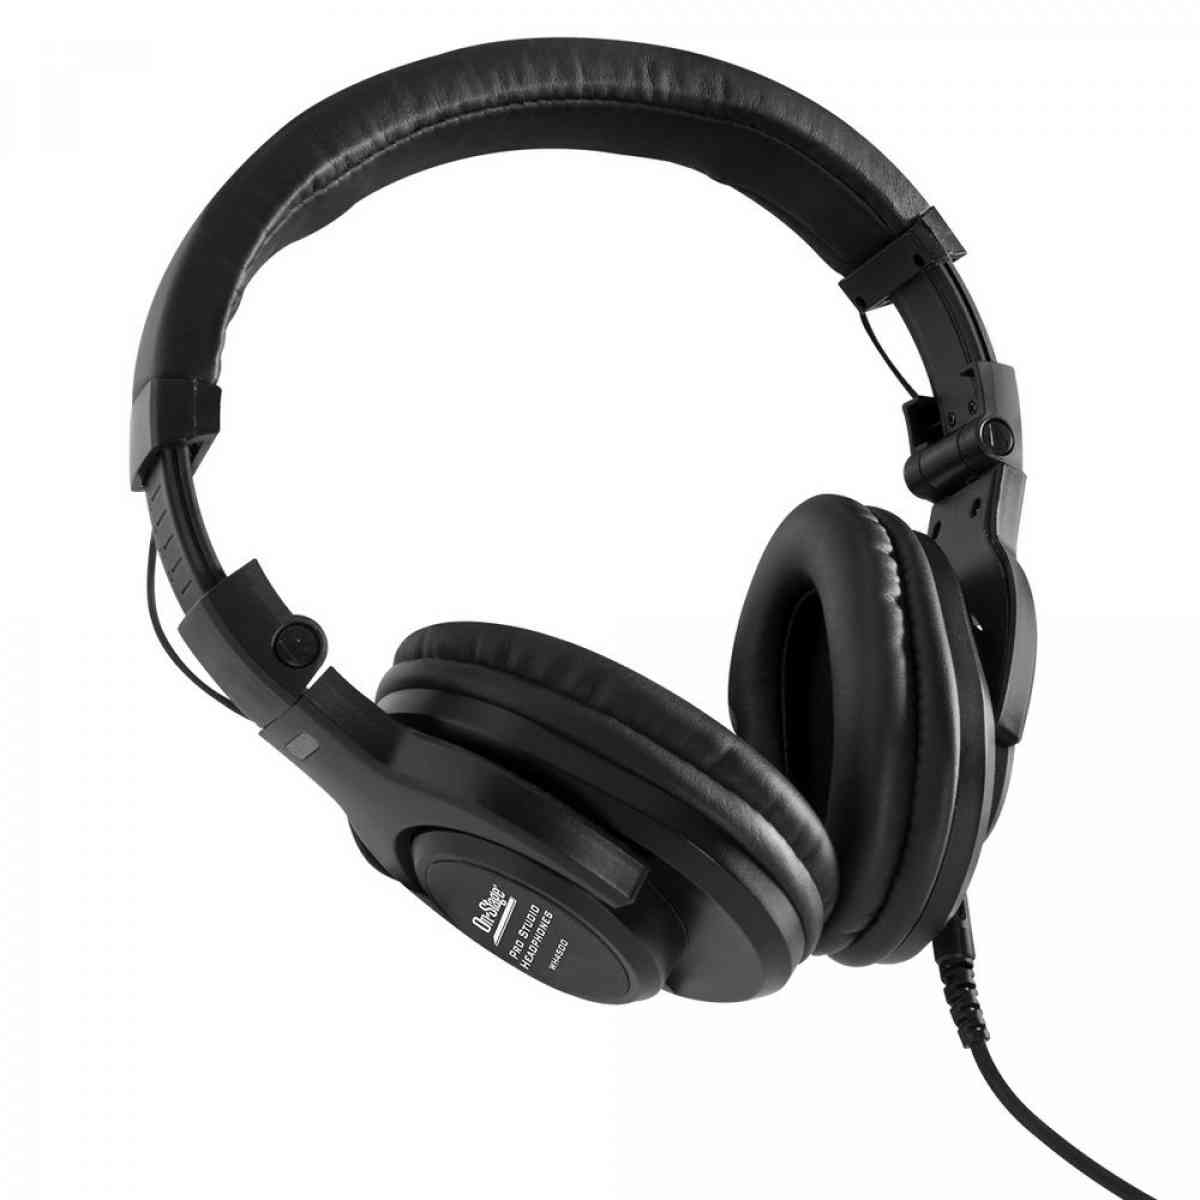 On-Stage WH4500 Professional Studio Headphones